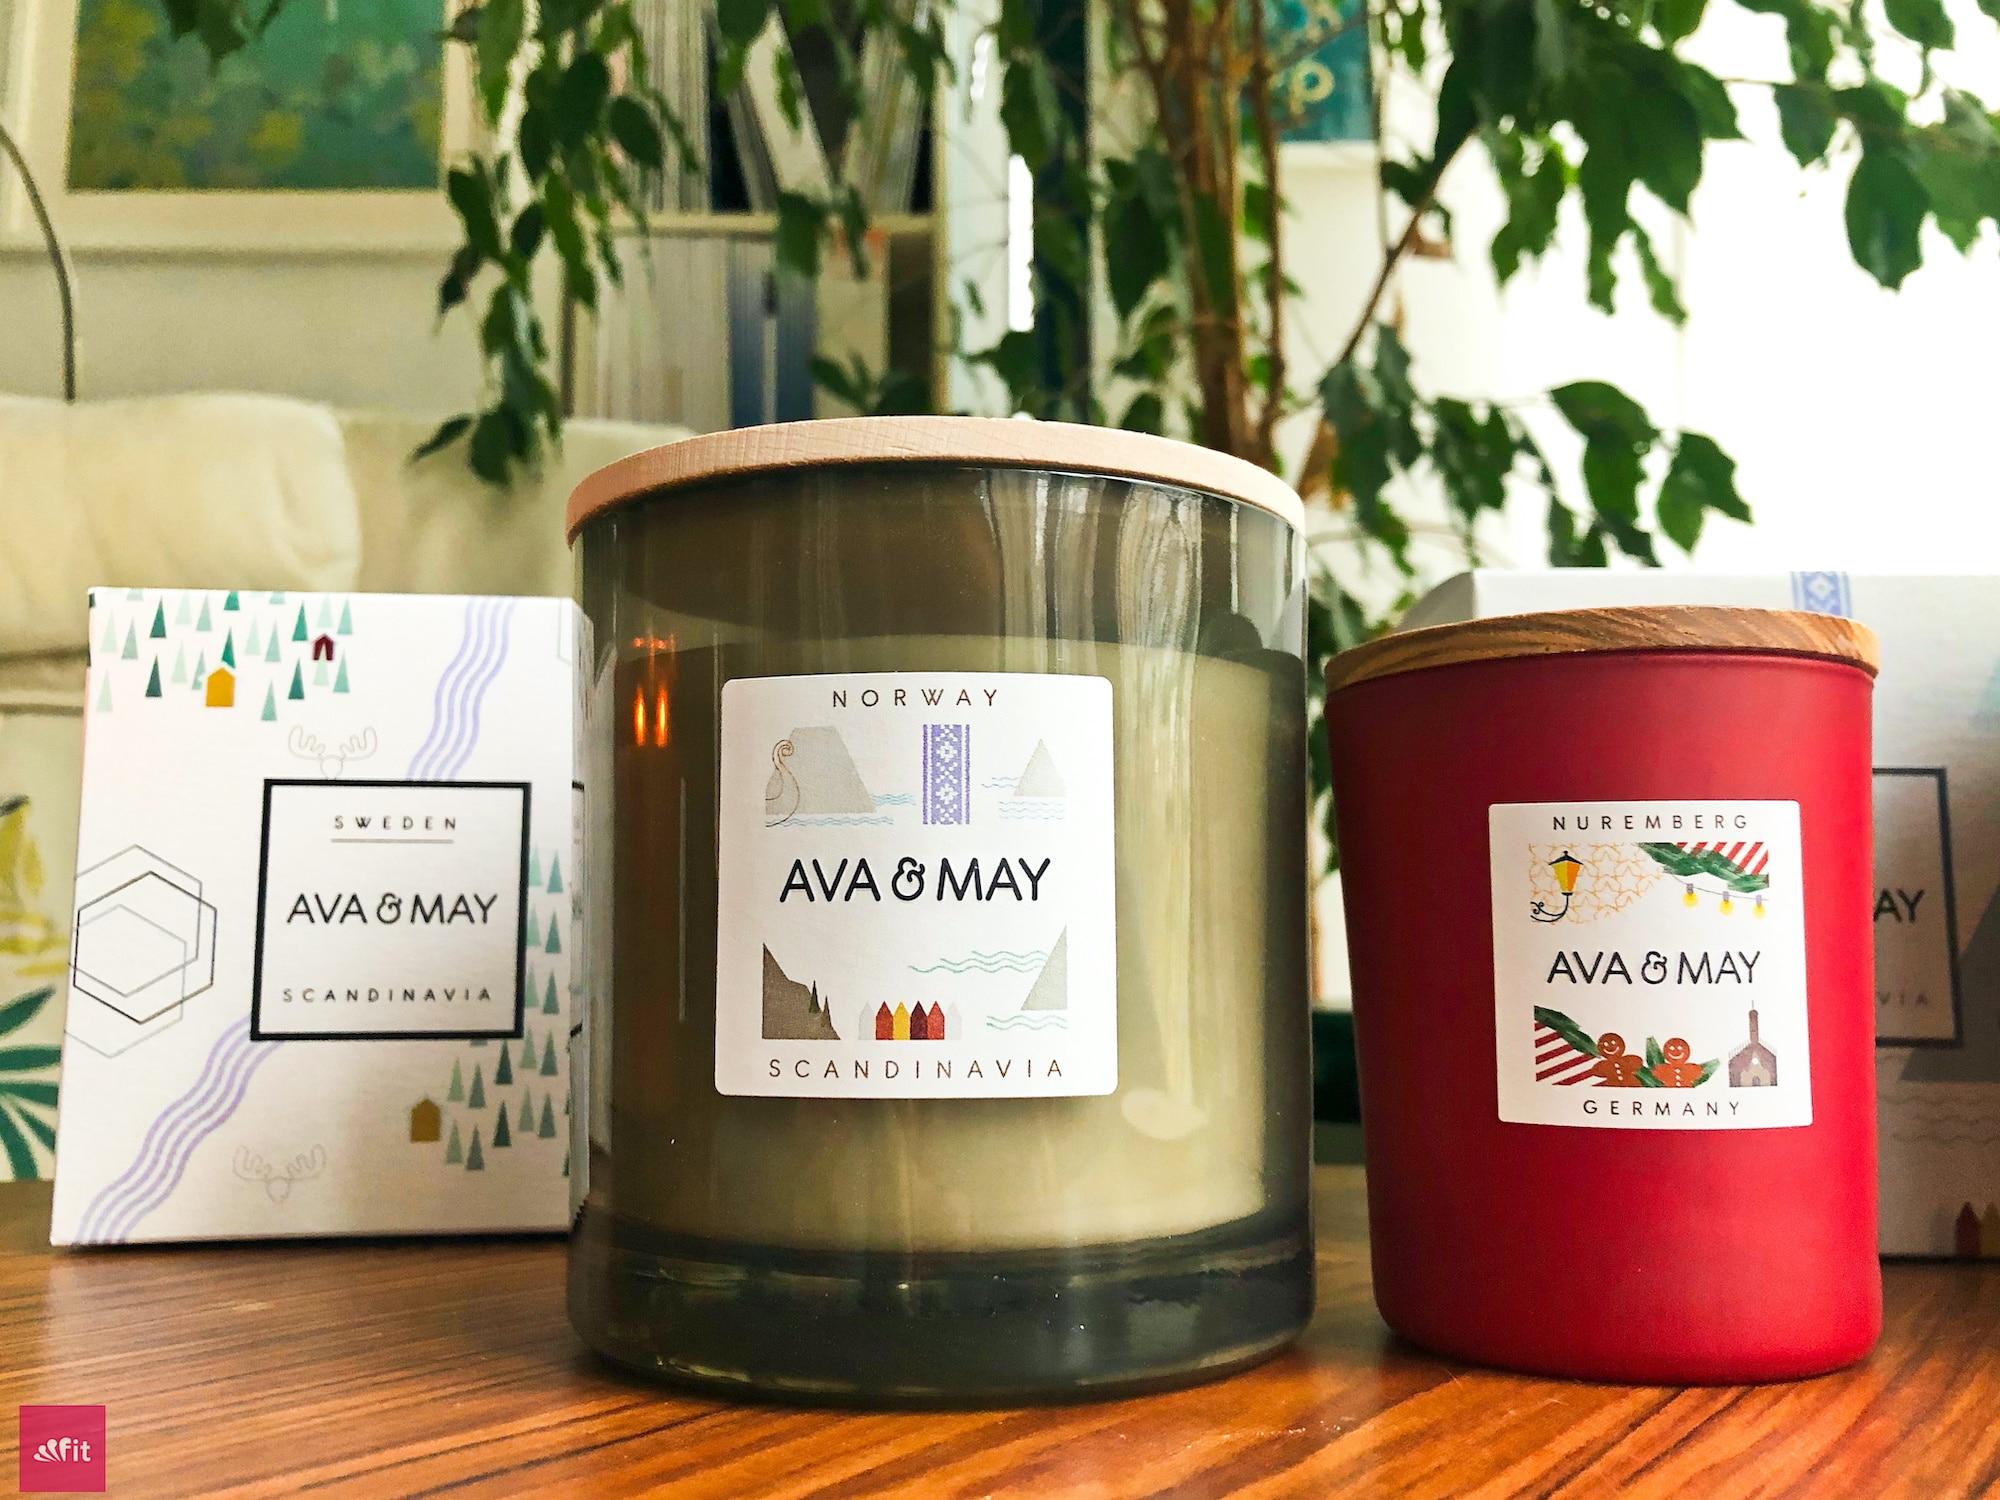 Ava and May große Kerze und normale Kerze im vergleich (500g vs. 180g)